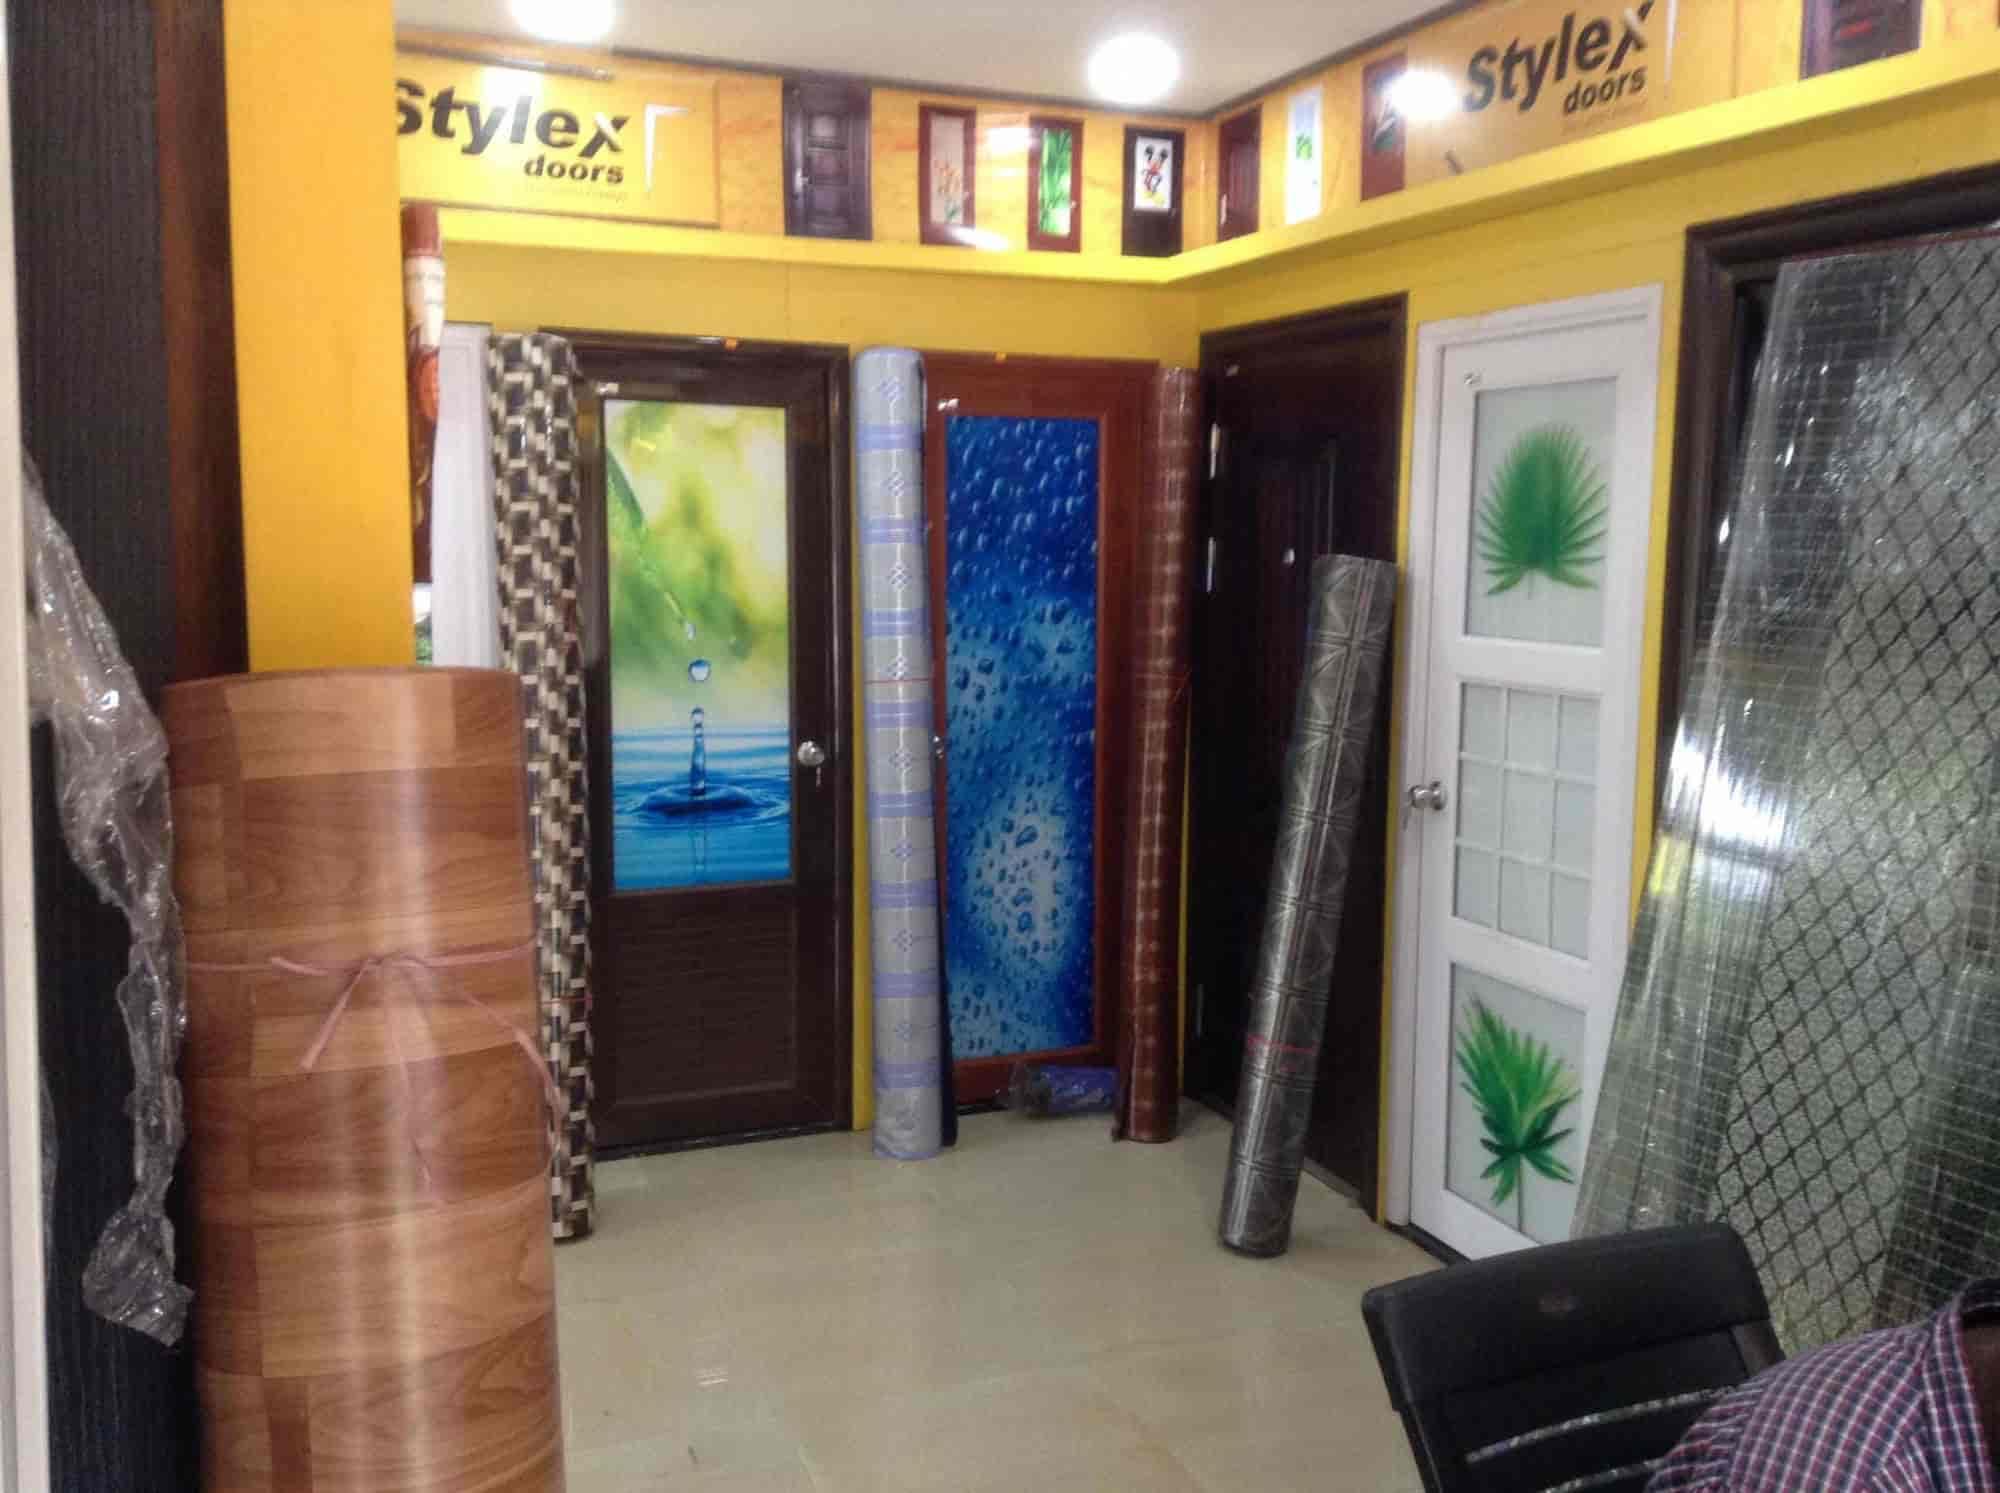 & Ideal Doors u0026 Ply Ramanattukara - Door Dealers in Kozhikode - Justdial